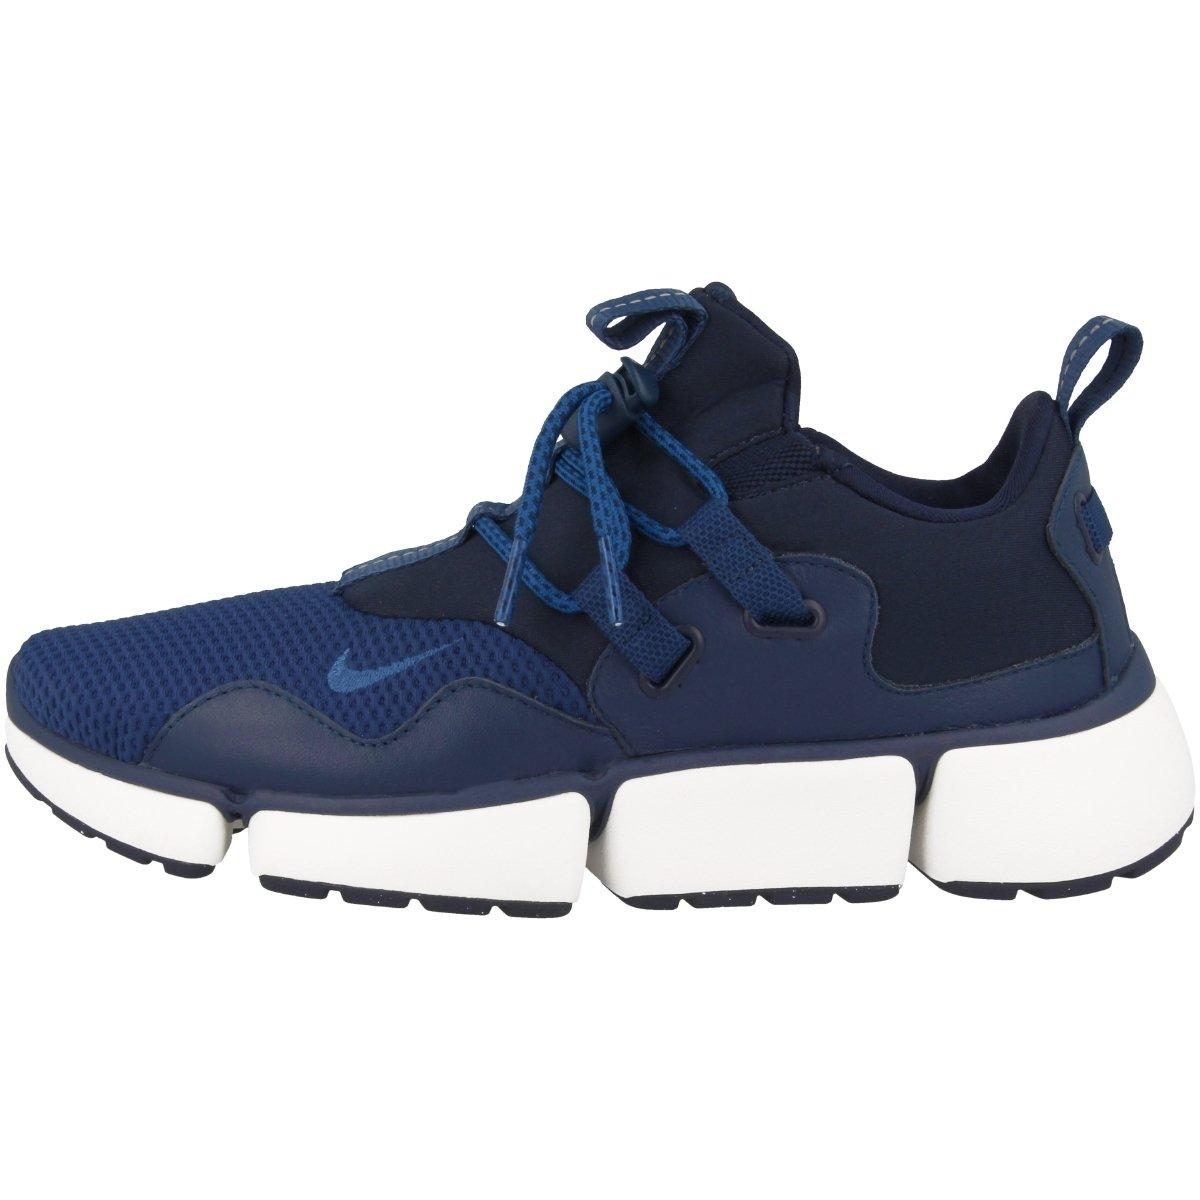 Nike Herren Pocket Knife DM Schuhe  41 EU|Obsidian-gym Blue-navy-sail (898033-401)